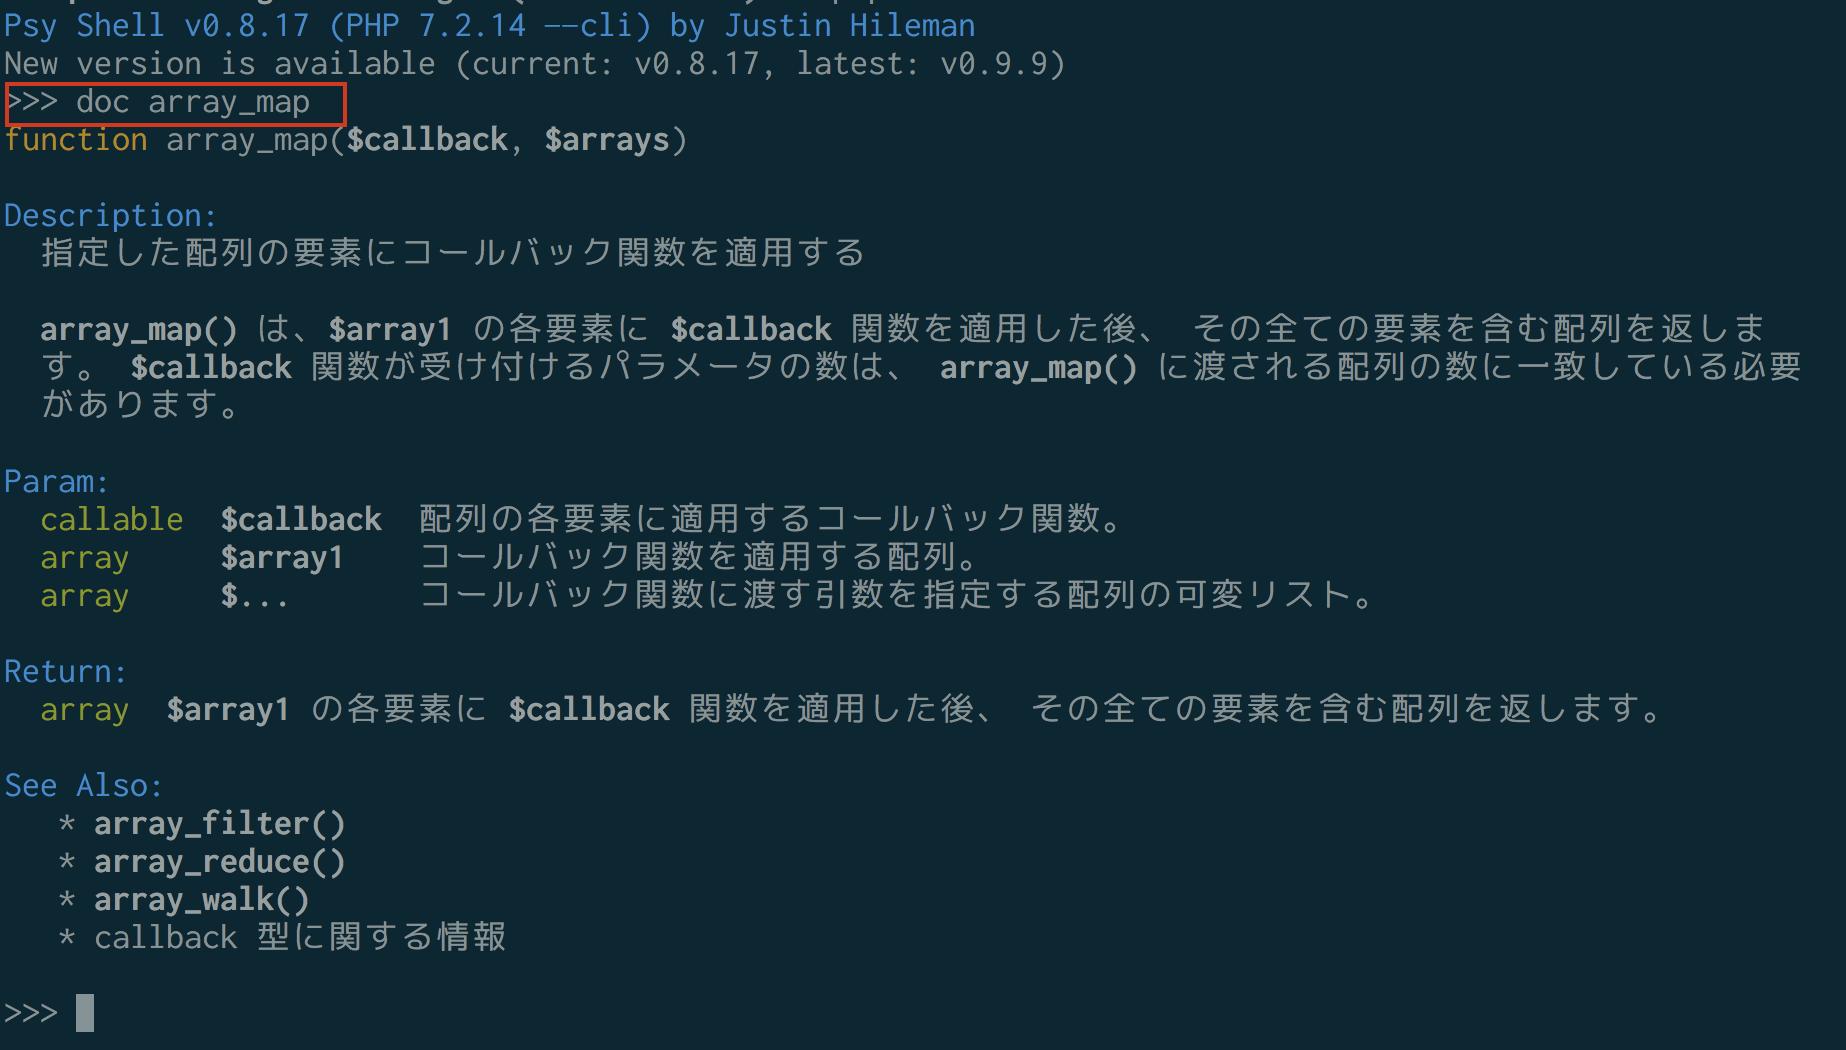 PsySHで関数のドキュメント表示